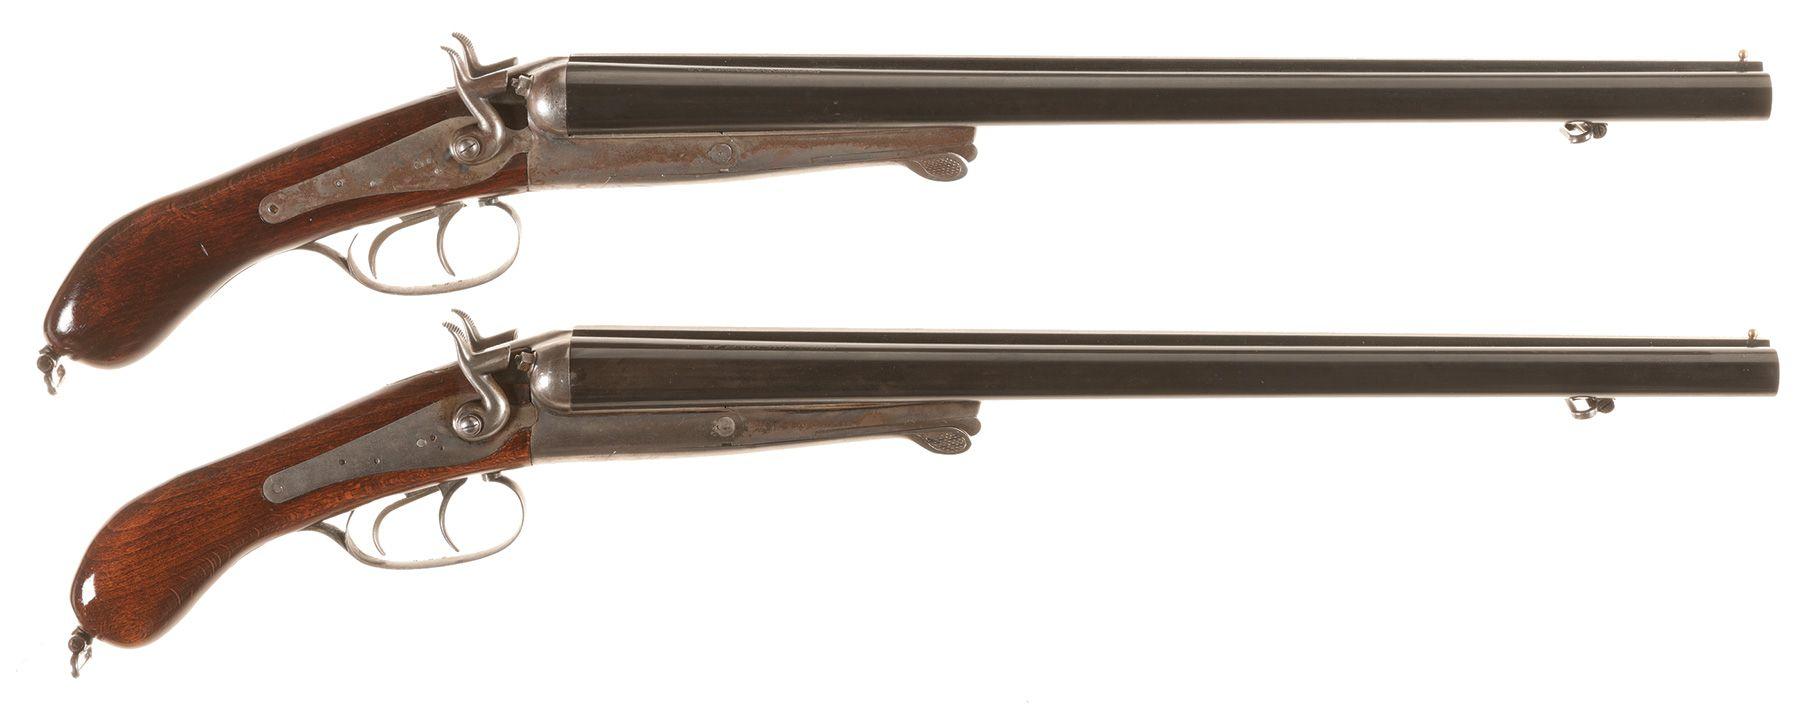 Two Husqvarna 'Lupara' Pattern Double Barrel Shotguns